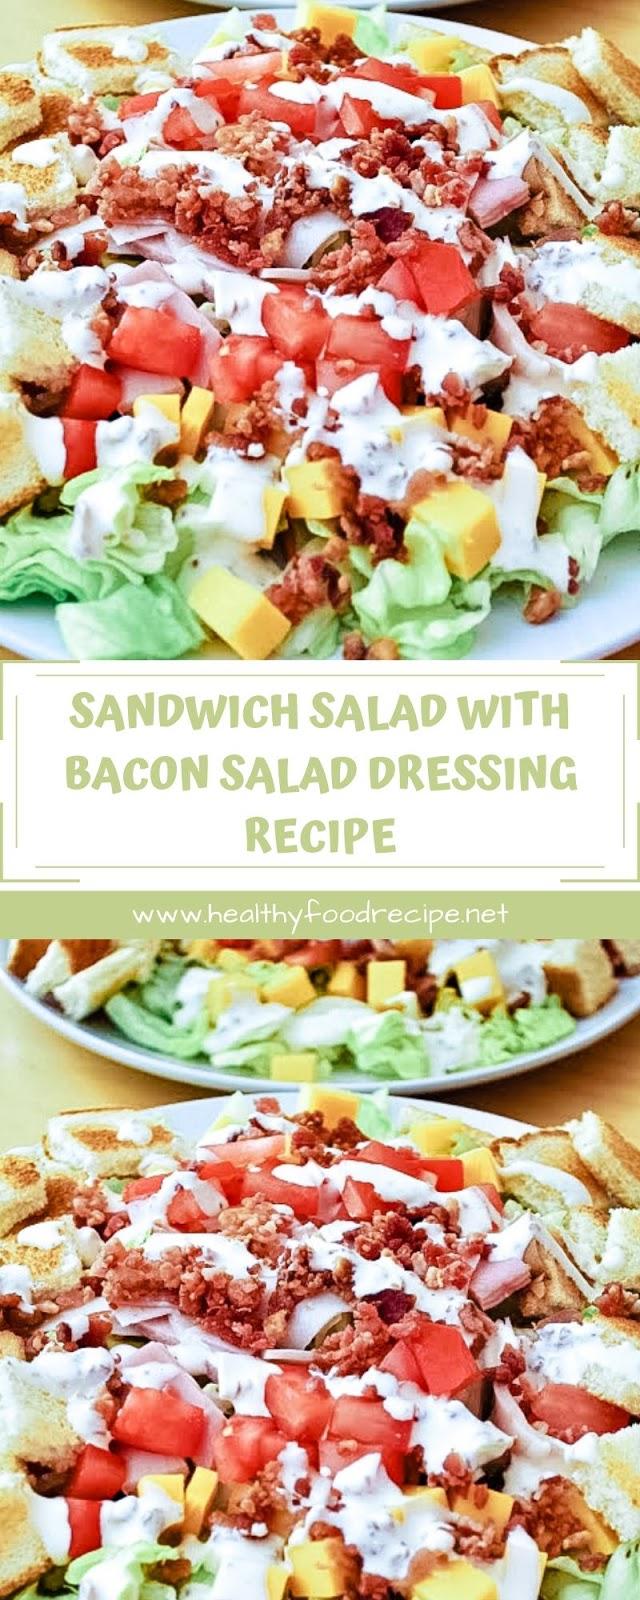 SANDWICH SALAD WITH BACON SALAD DRESSING RECIPE